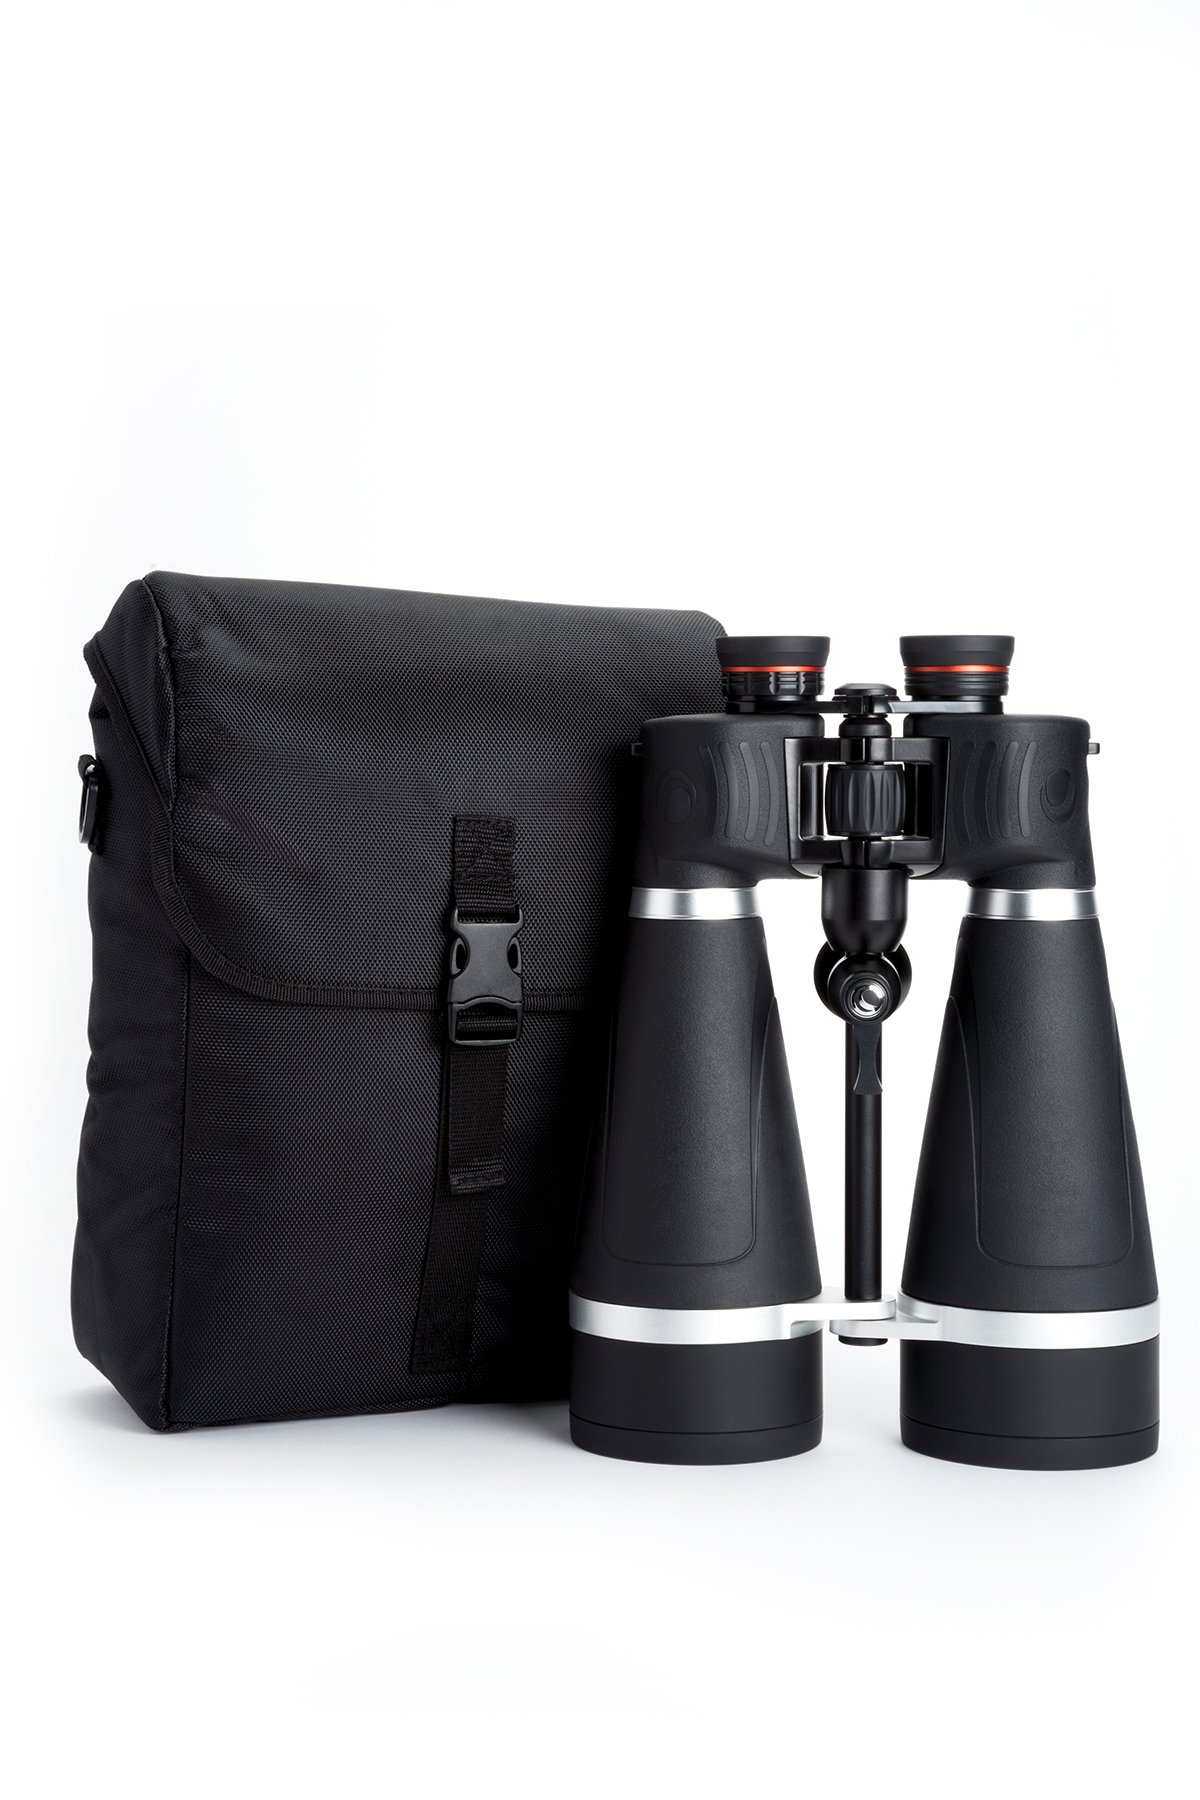 Celestron 20x80 SkyMaster Pro High Power Astronomy Binoculars by Celestron (Image #5)